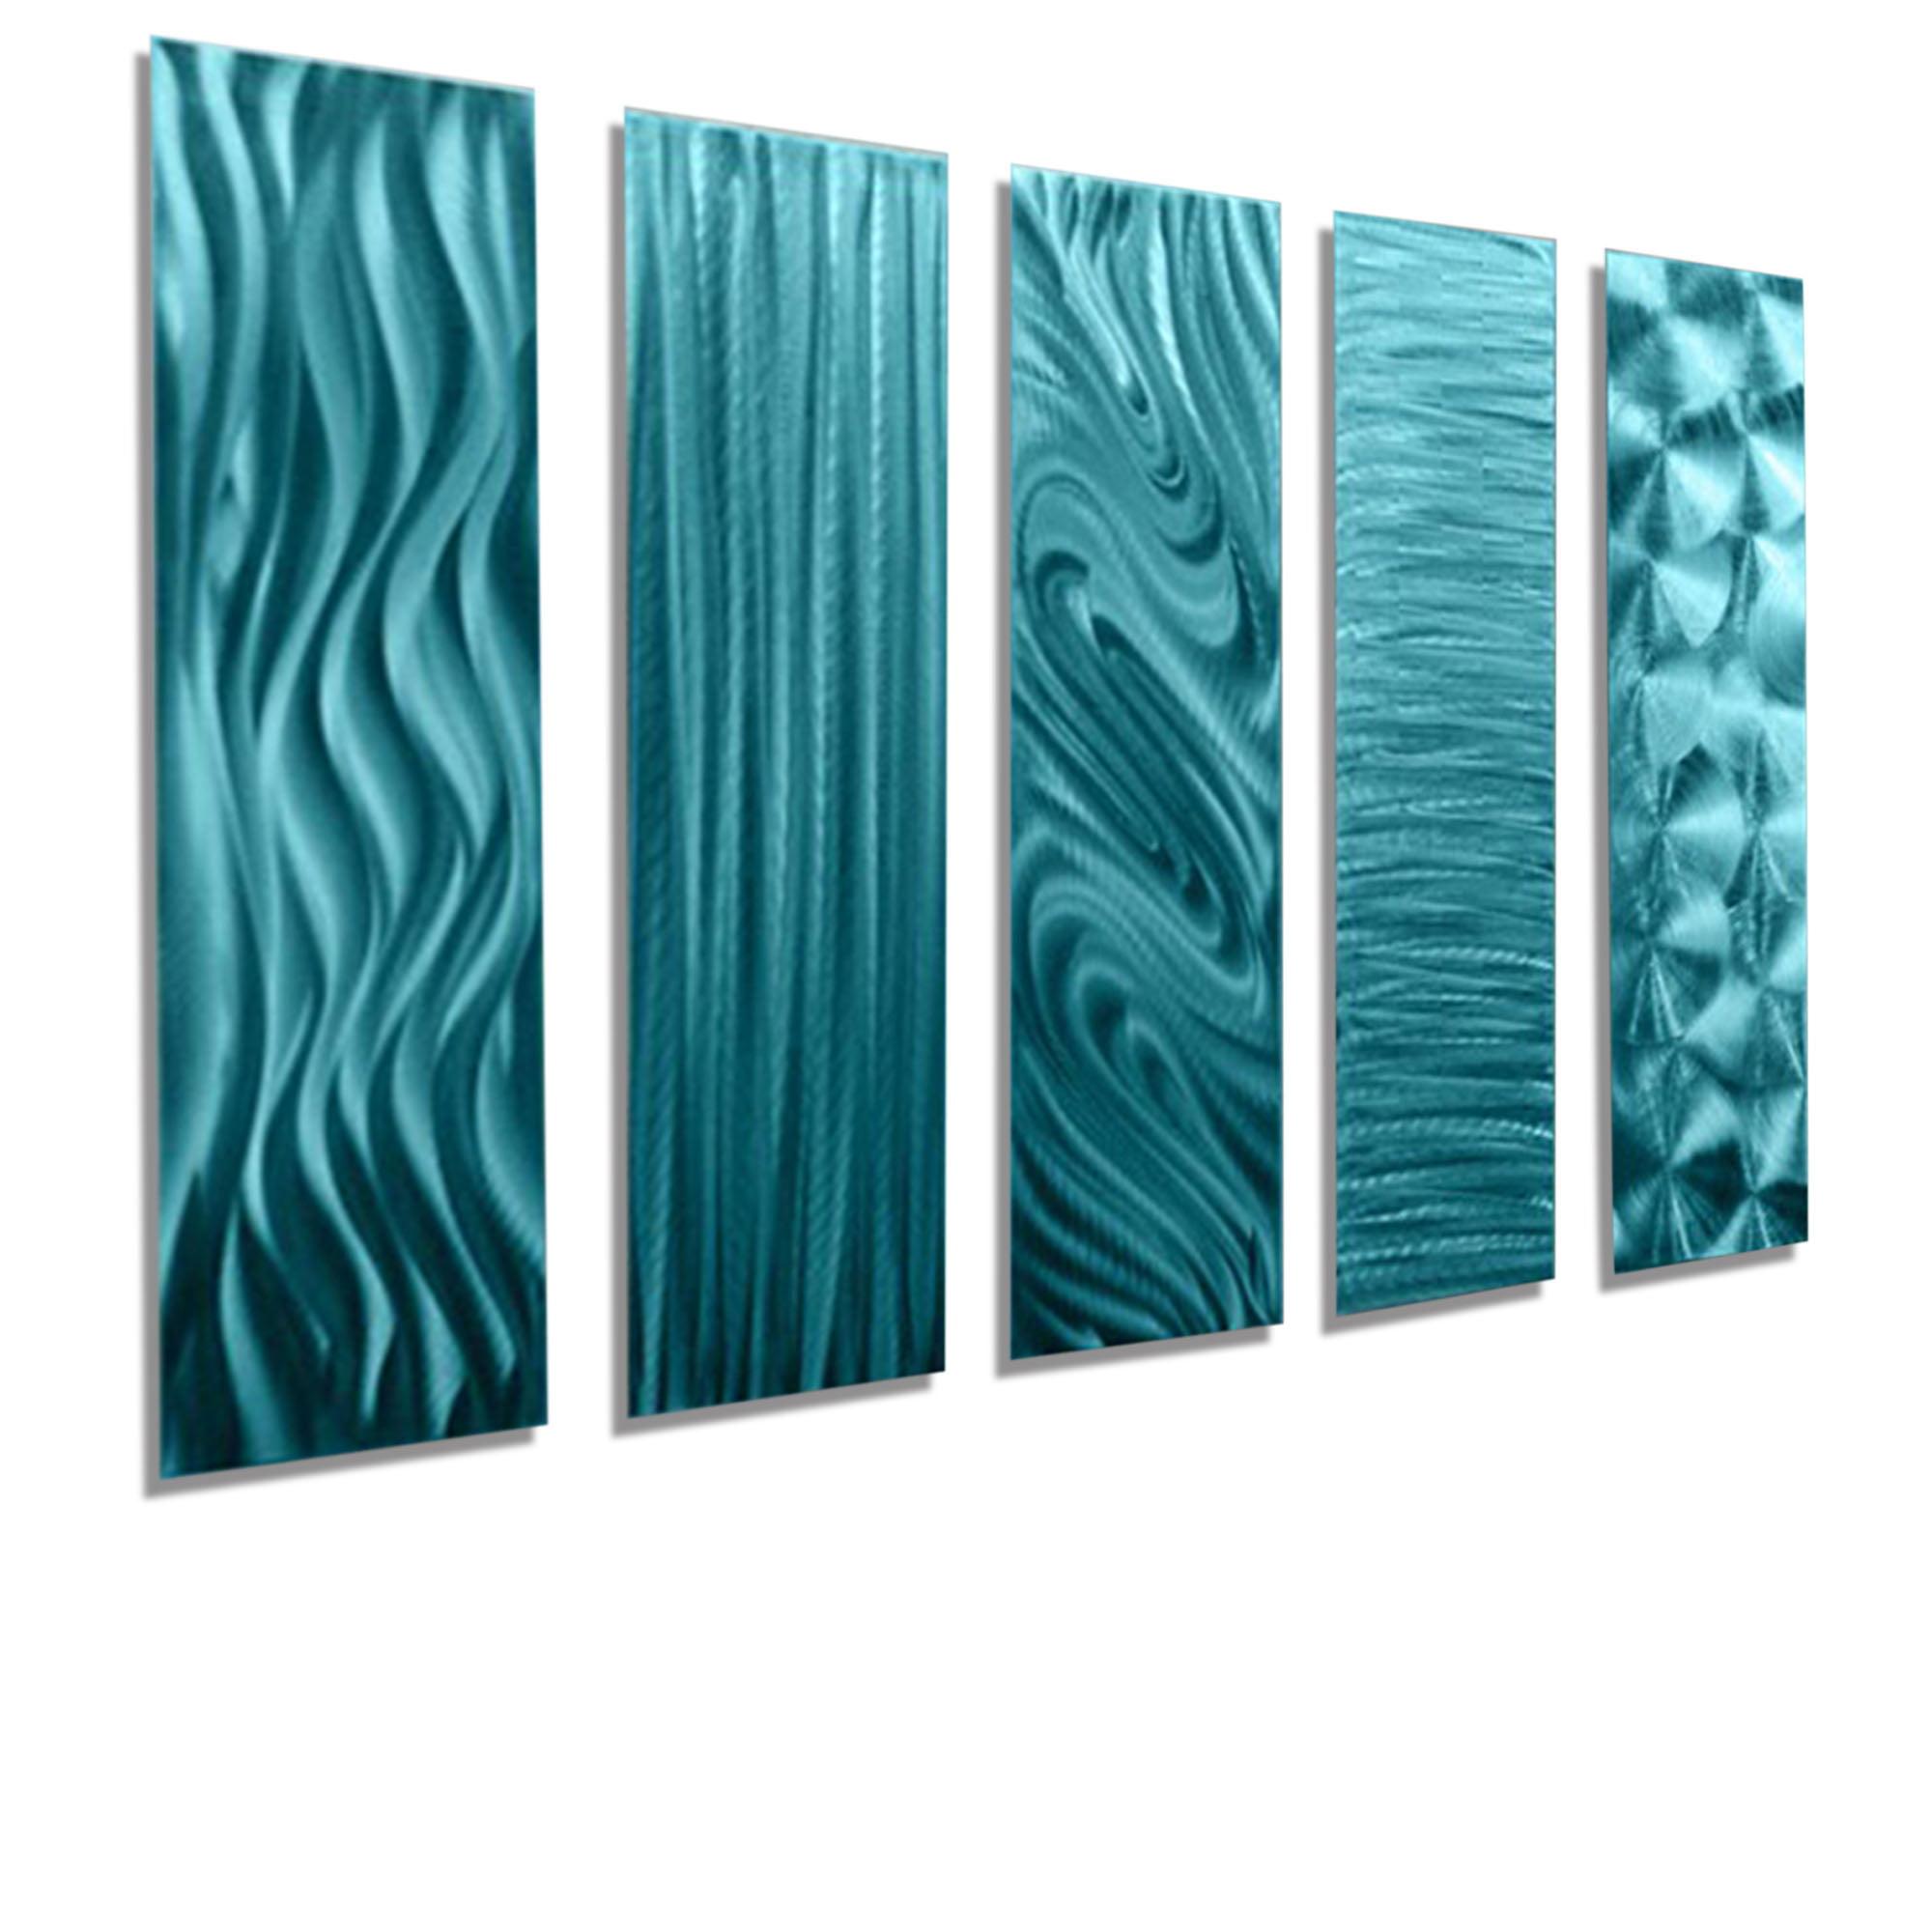 Statements2000 Abstract Metal Wall Art Accent Panels Blue Green by Jon Allen